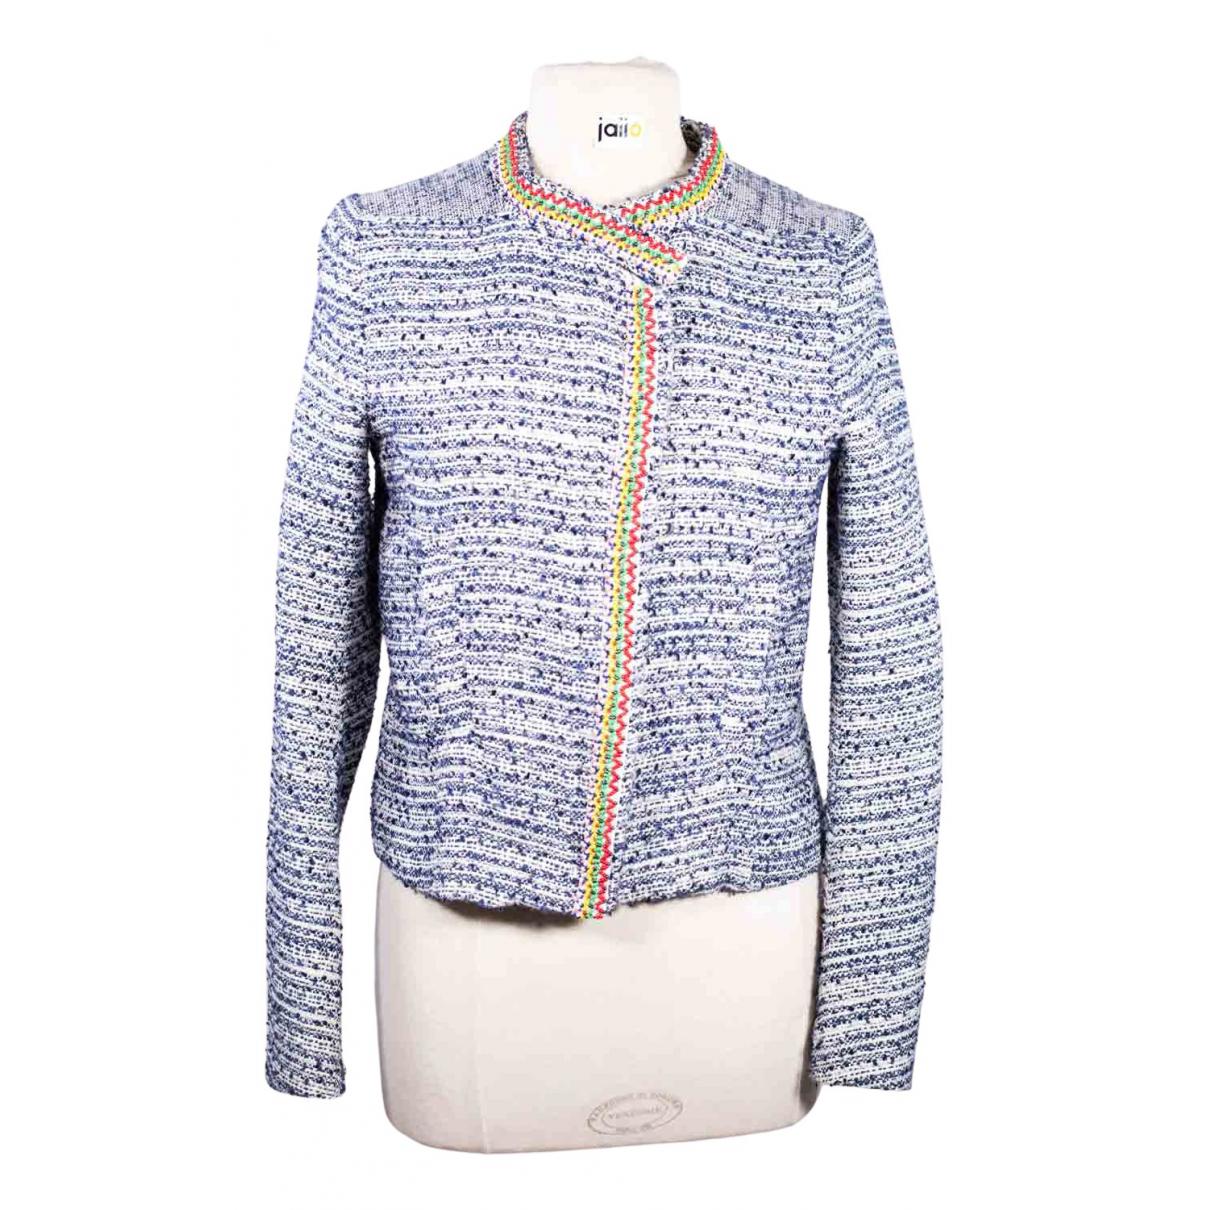 Maje - Veste   pour femme en tweed - bleu